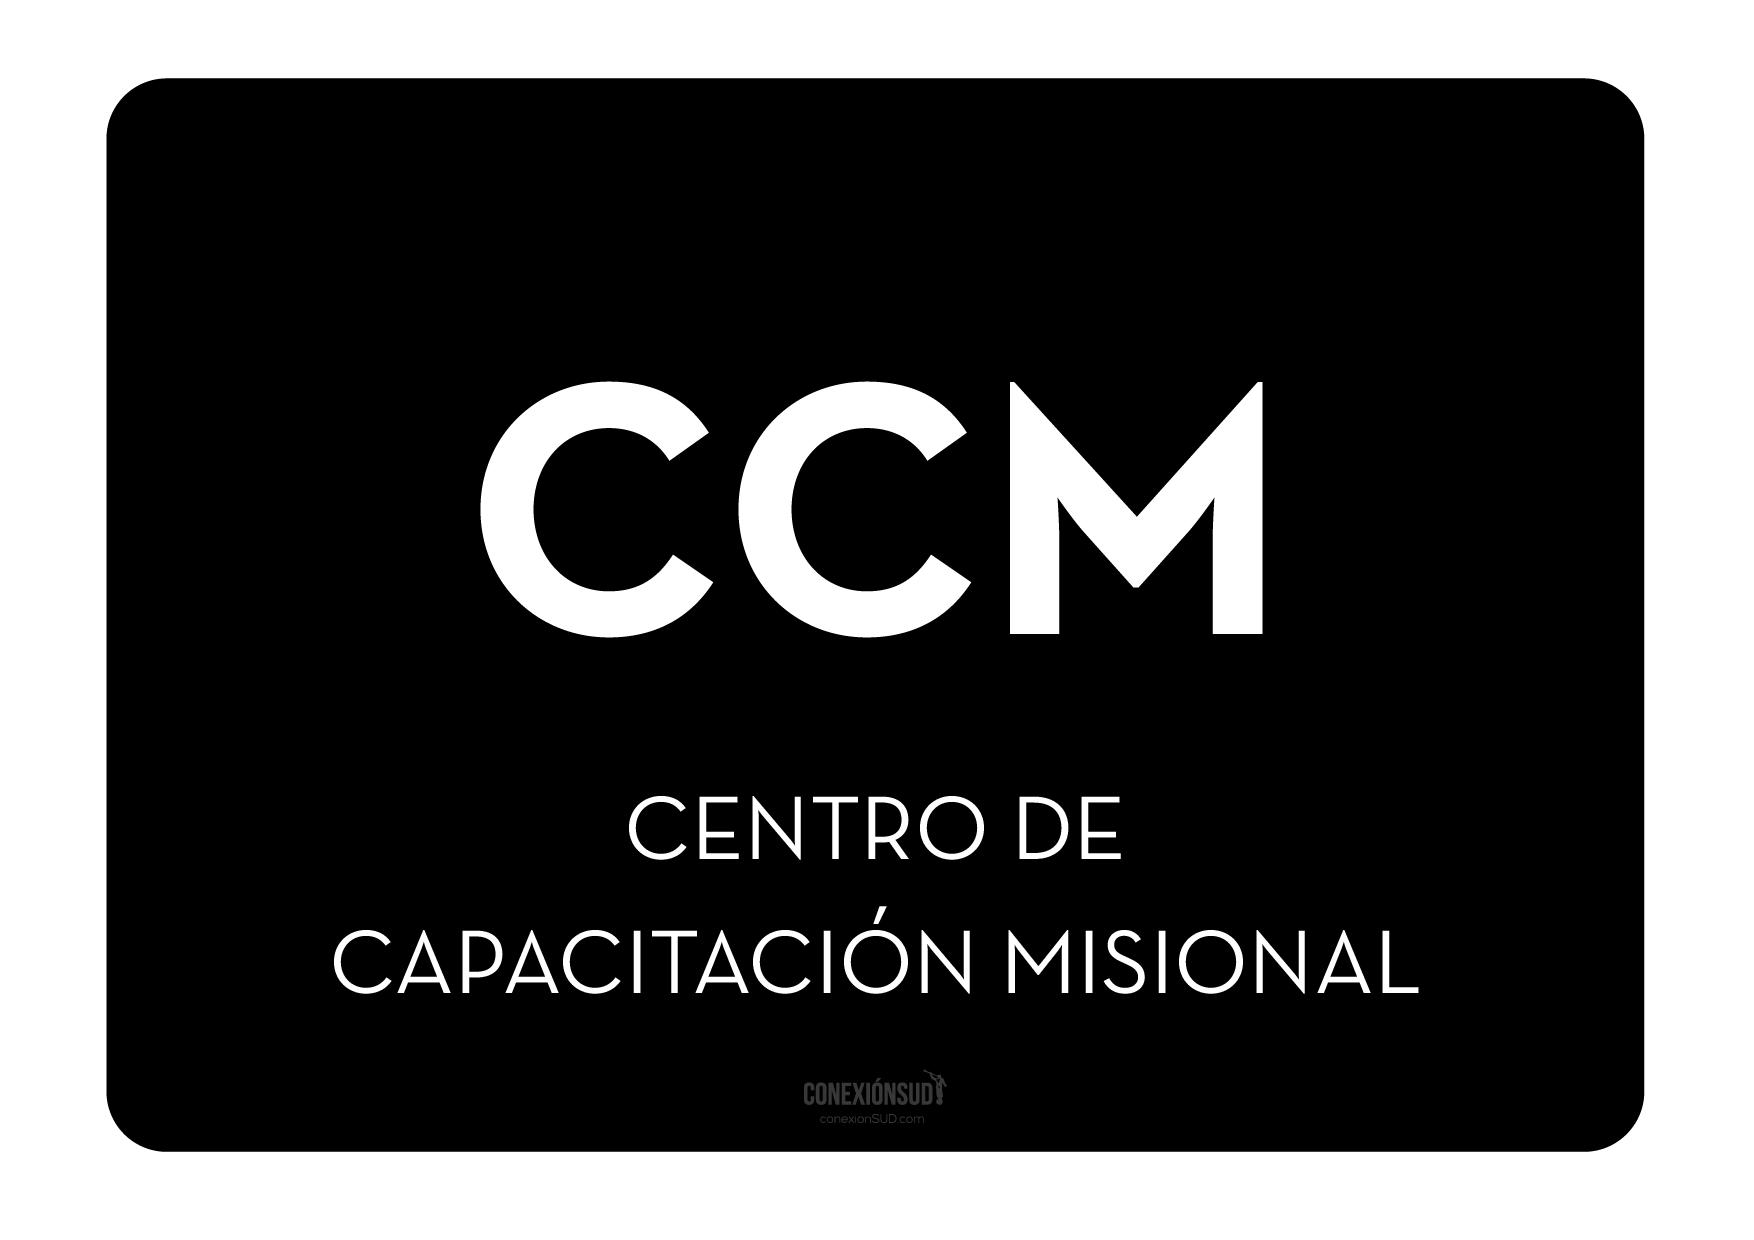 misionero por un dia - CCM_ConexionSUD-04